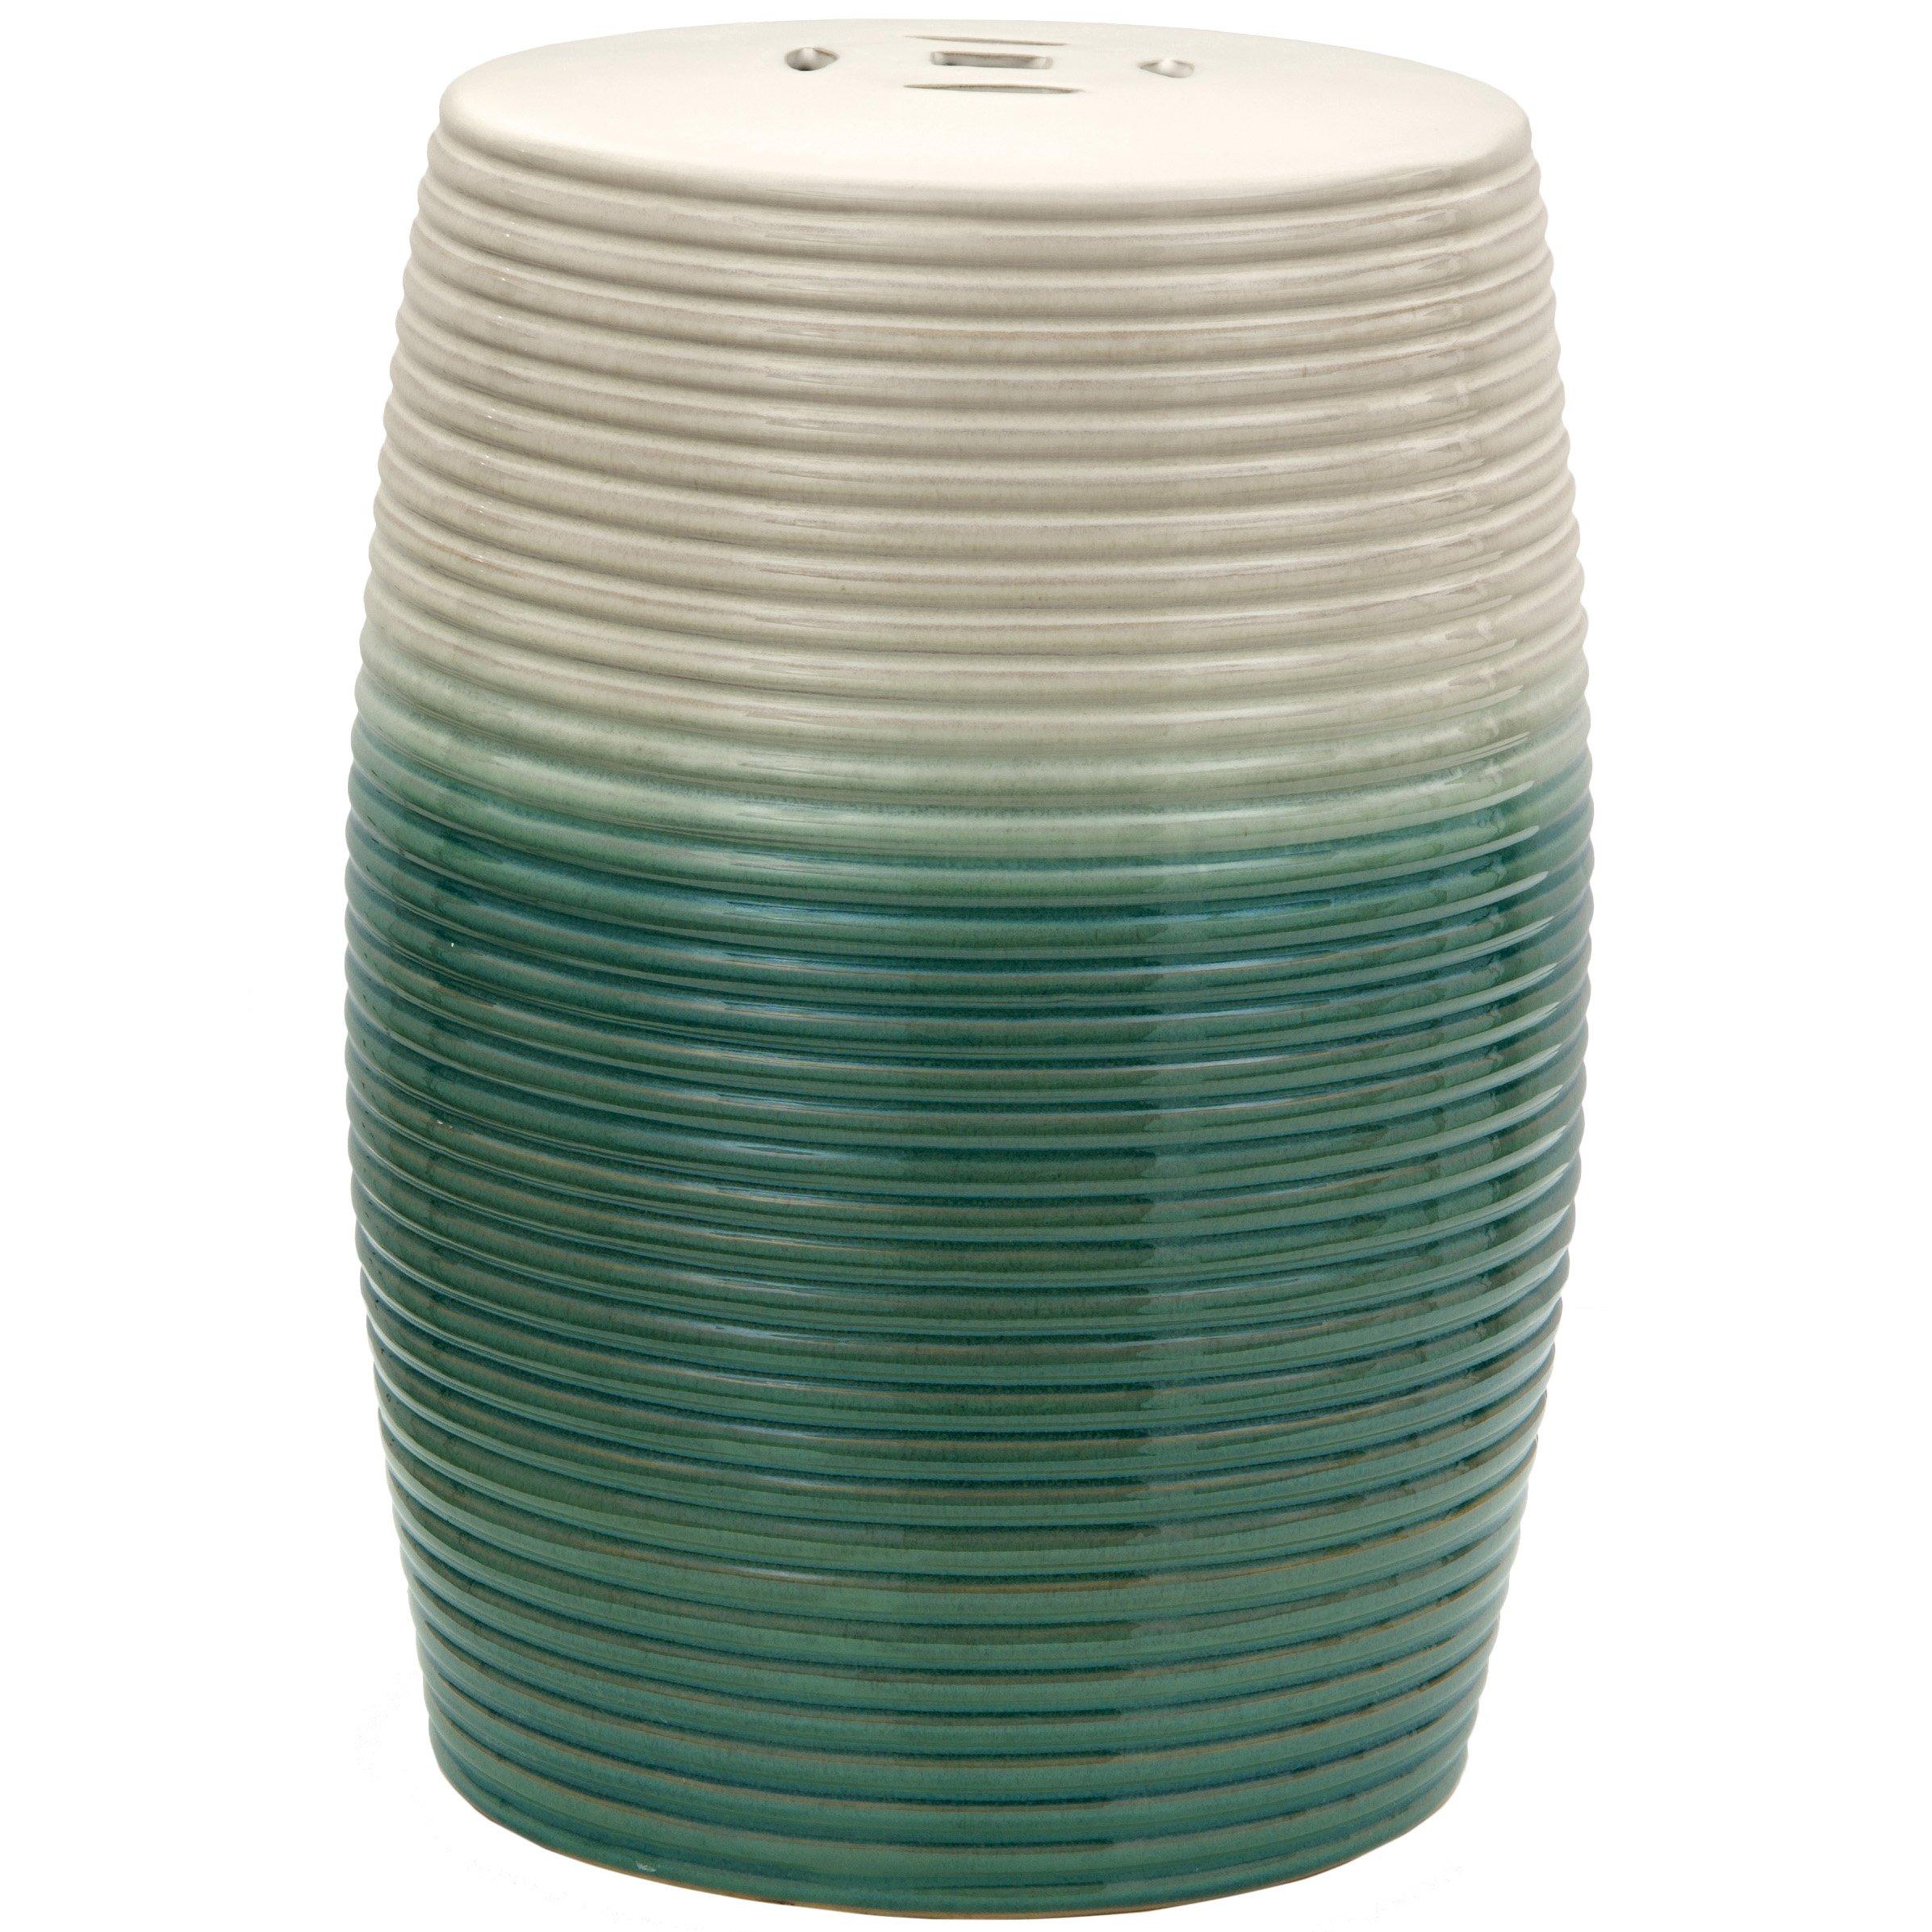 Oriental Furniture 18'' Beige & Green Ribbed Porcelain Garden Stool